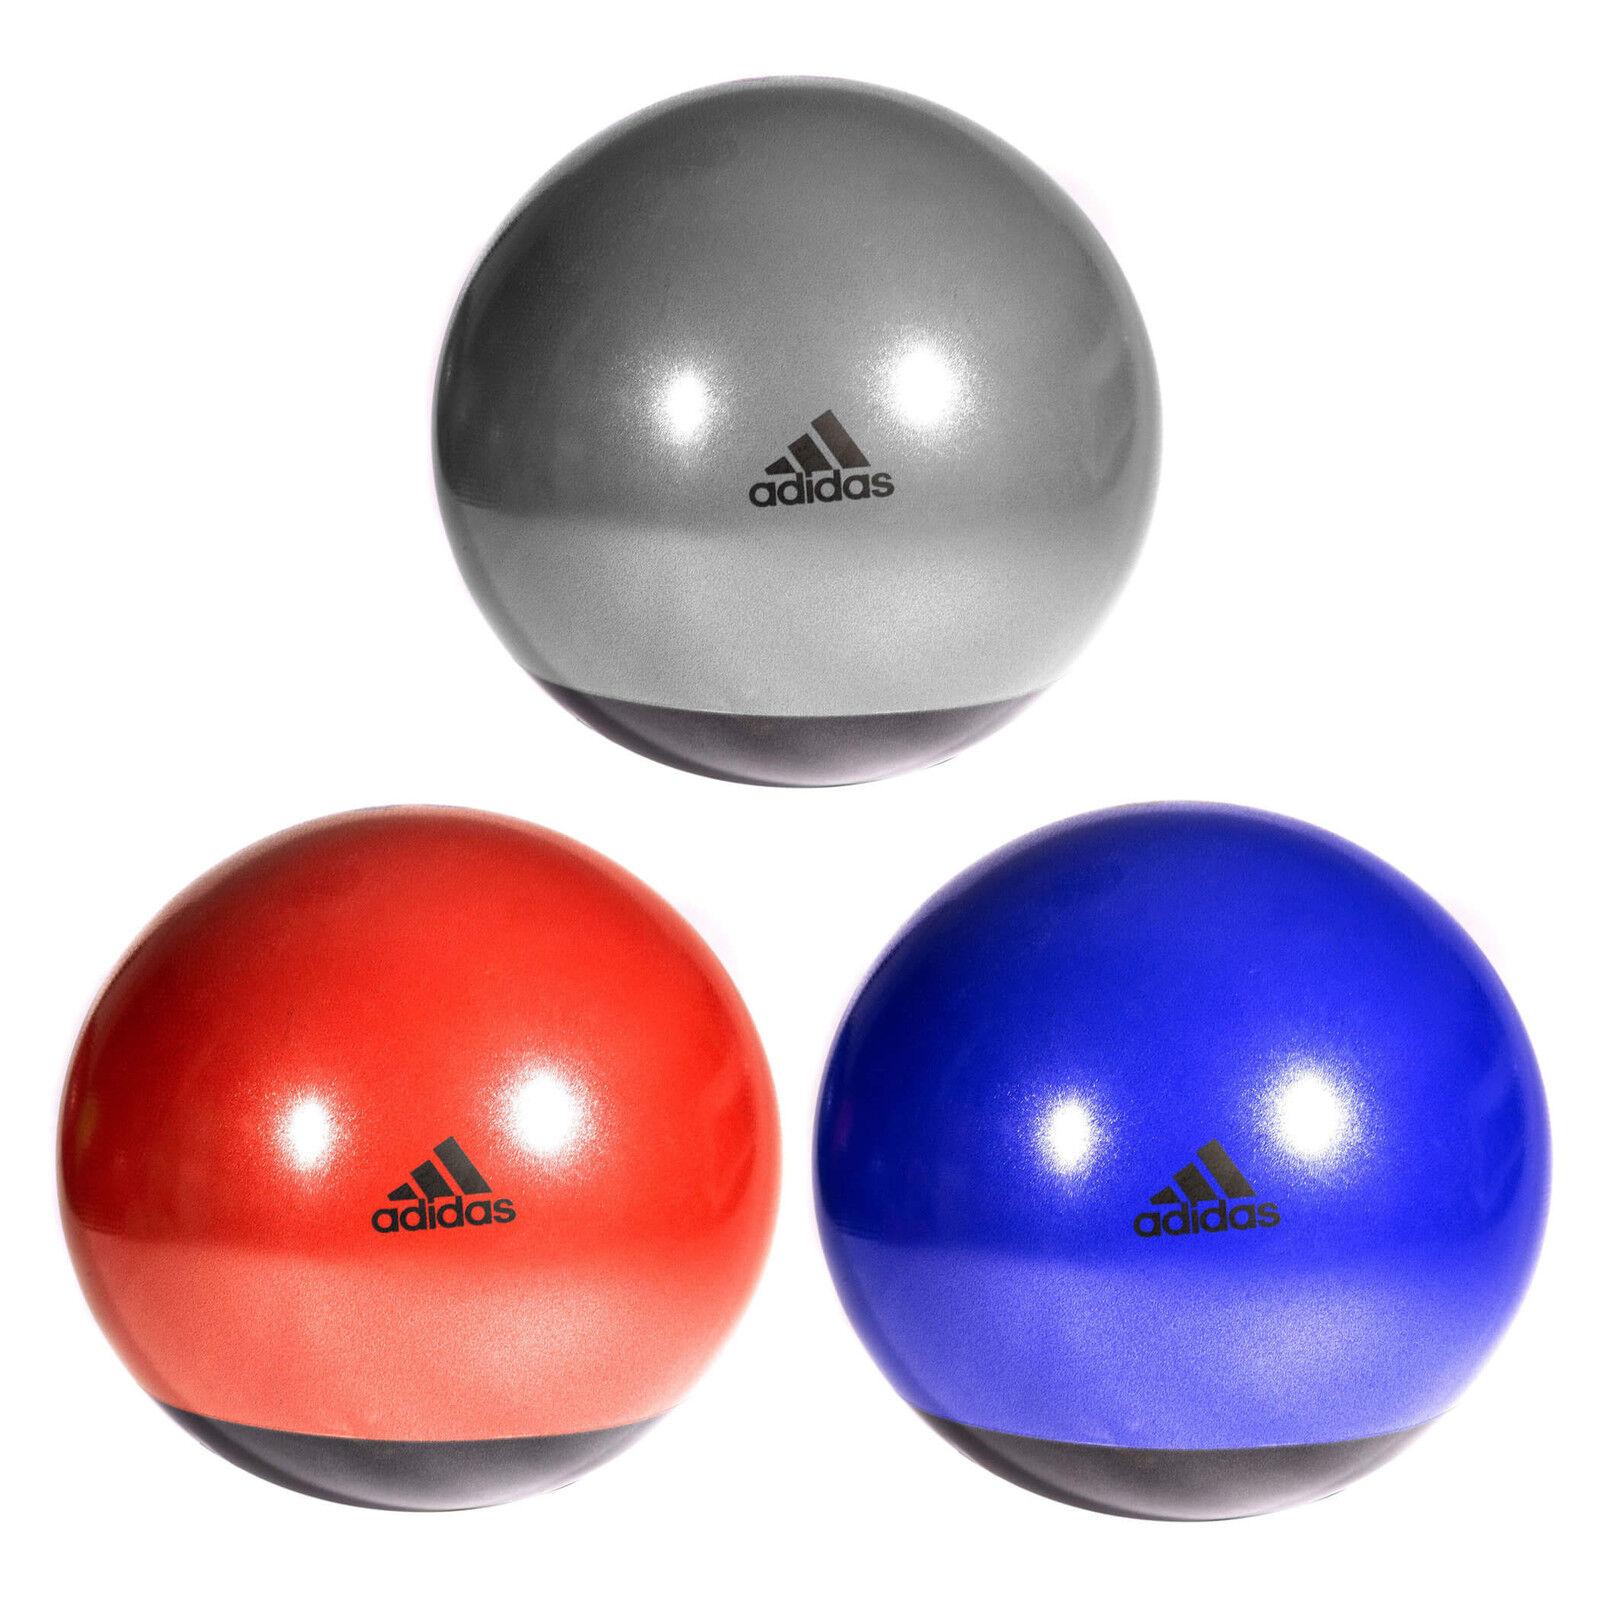 deseo respirar distorsión  Adidas Gym Swiss Ball Stability Premium Weighted Exercise Fitness Yoga 65cm    eBay